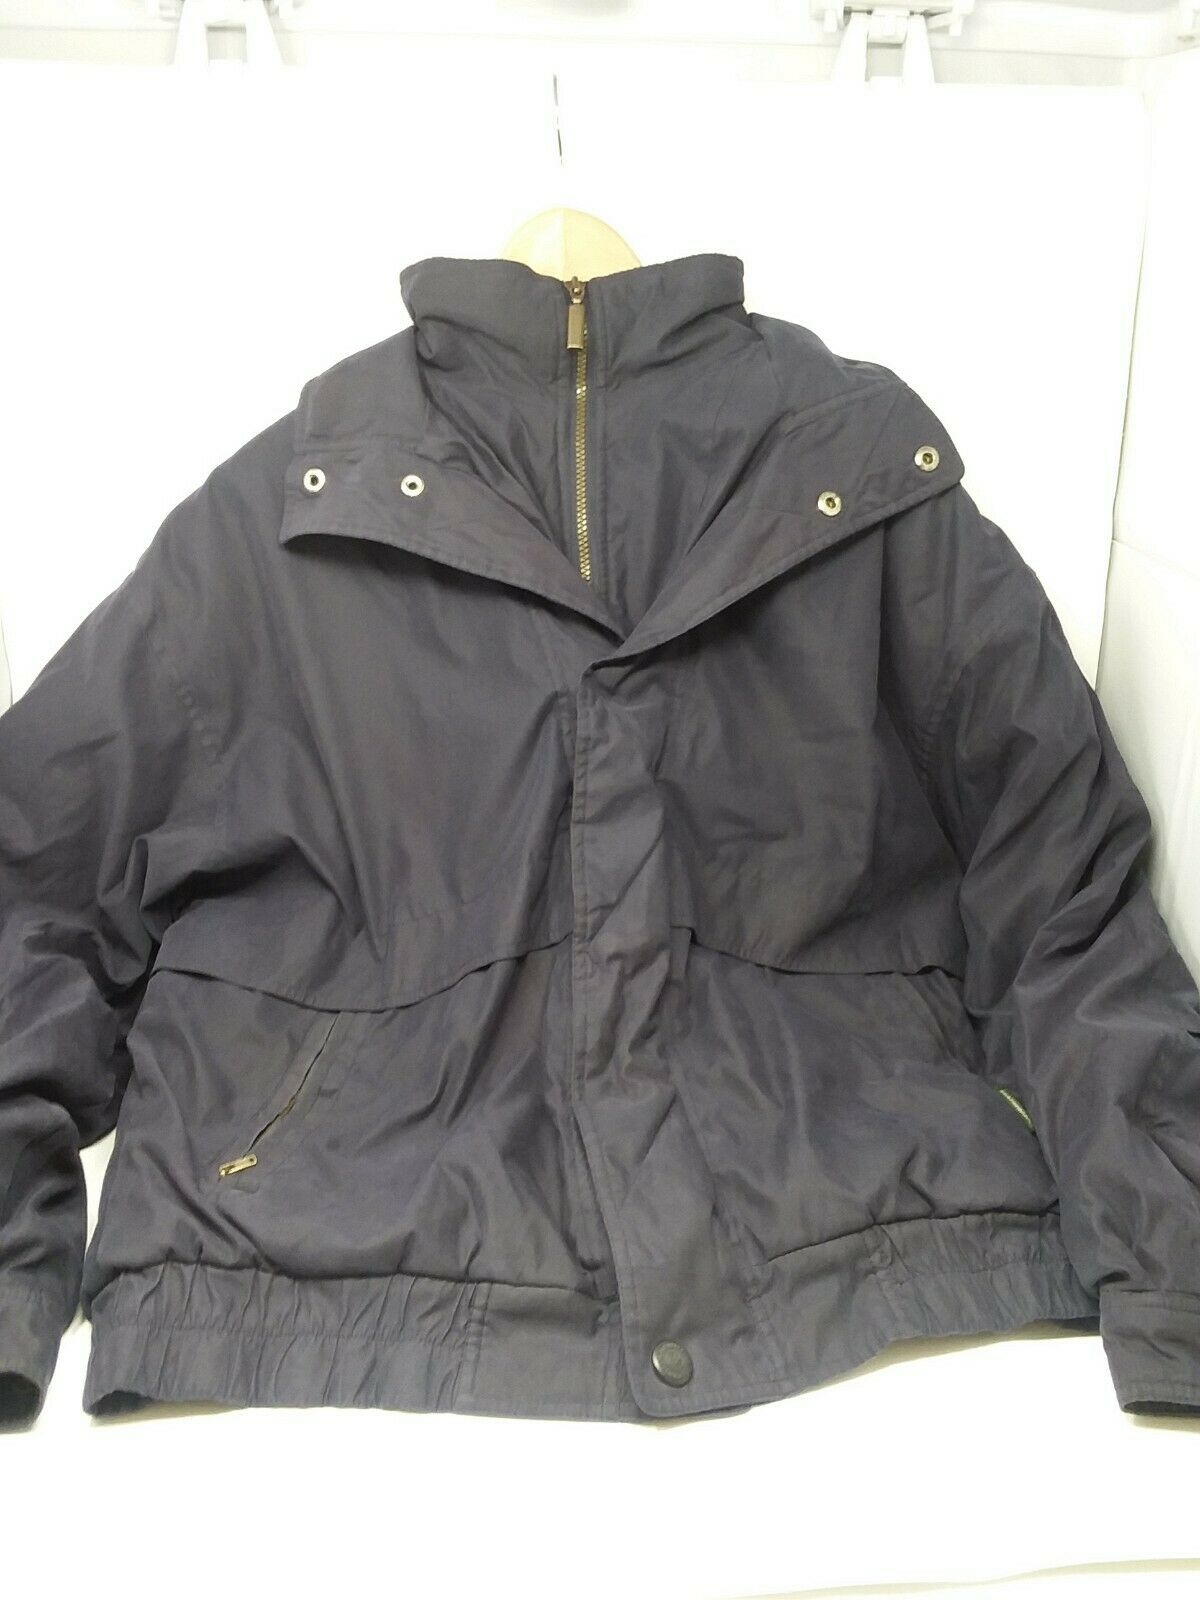 cae9f15e64 Men's bluee Navy Weatherproo Zip Up Hooded Coat With Fleece Lining Size  Large